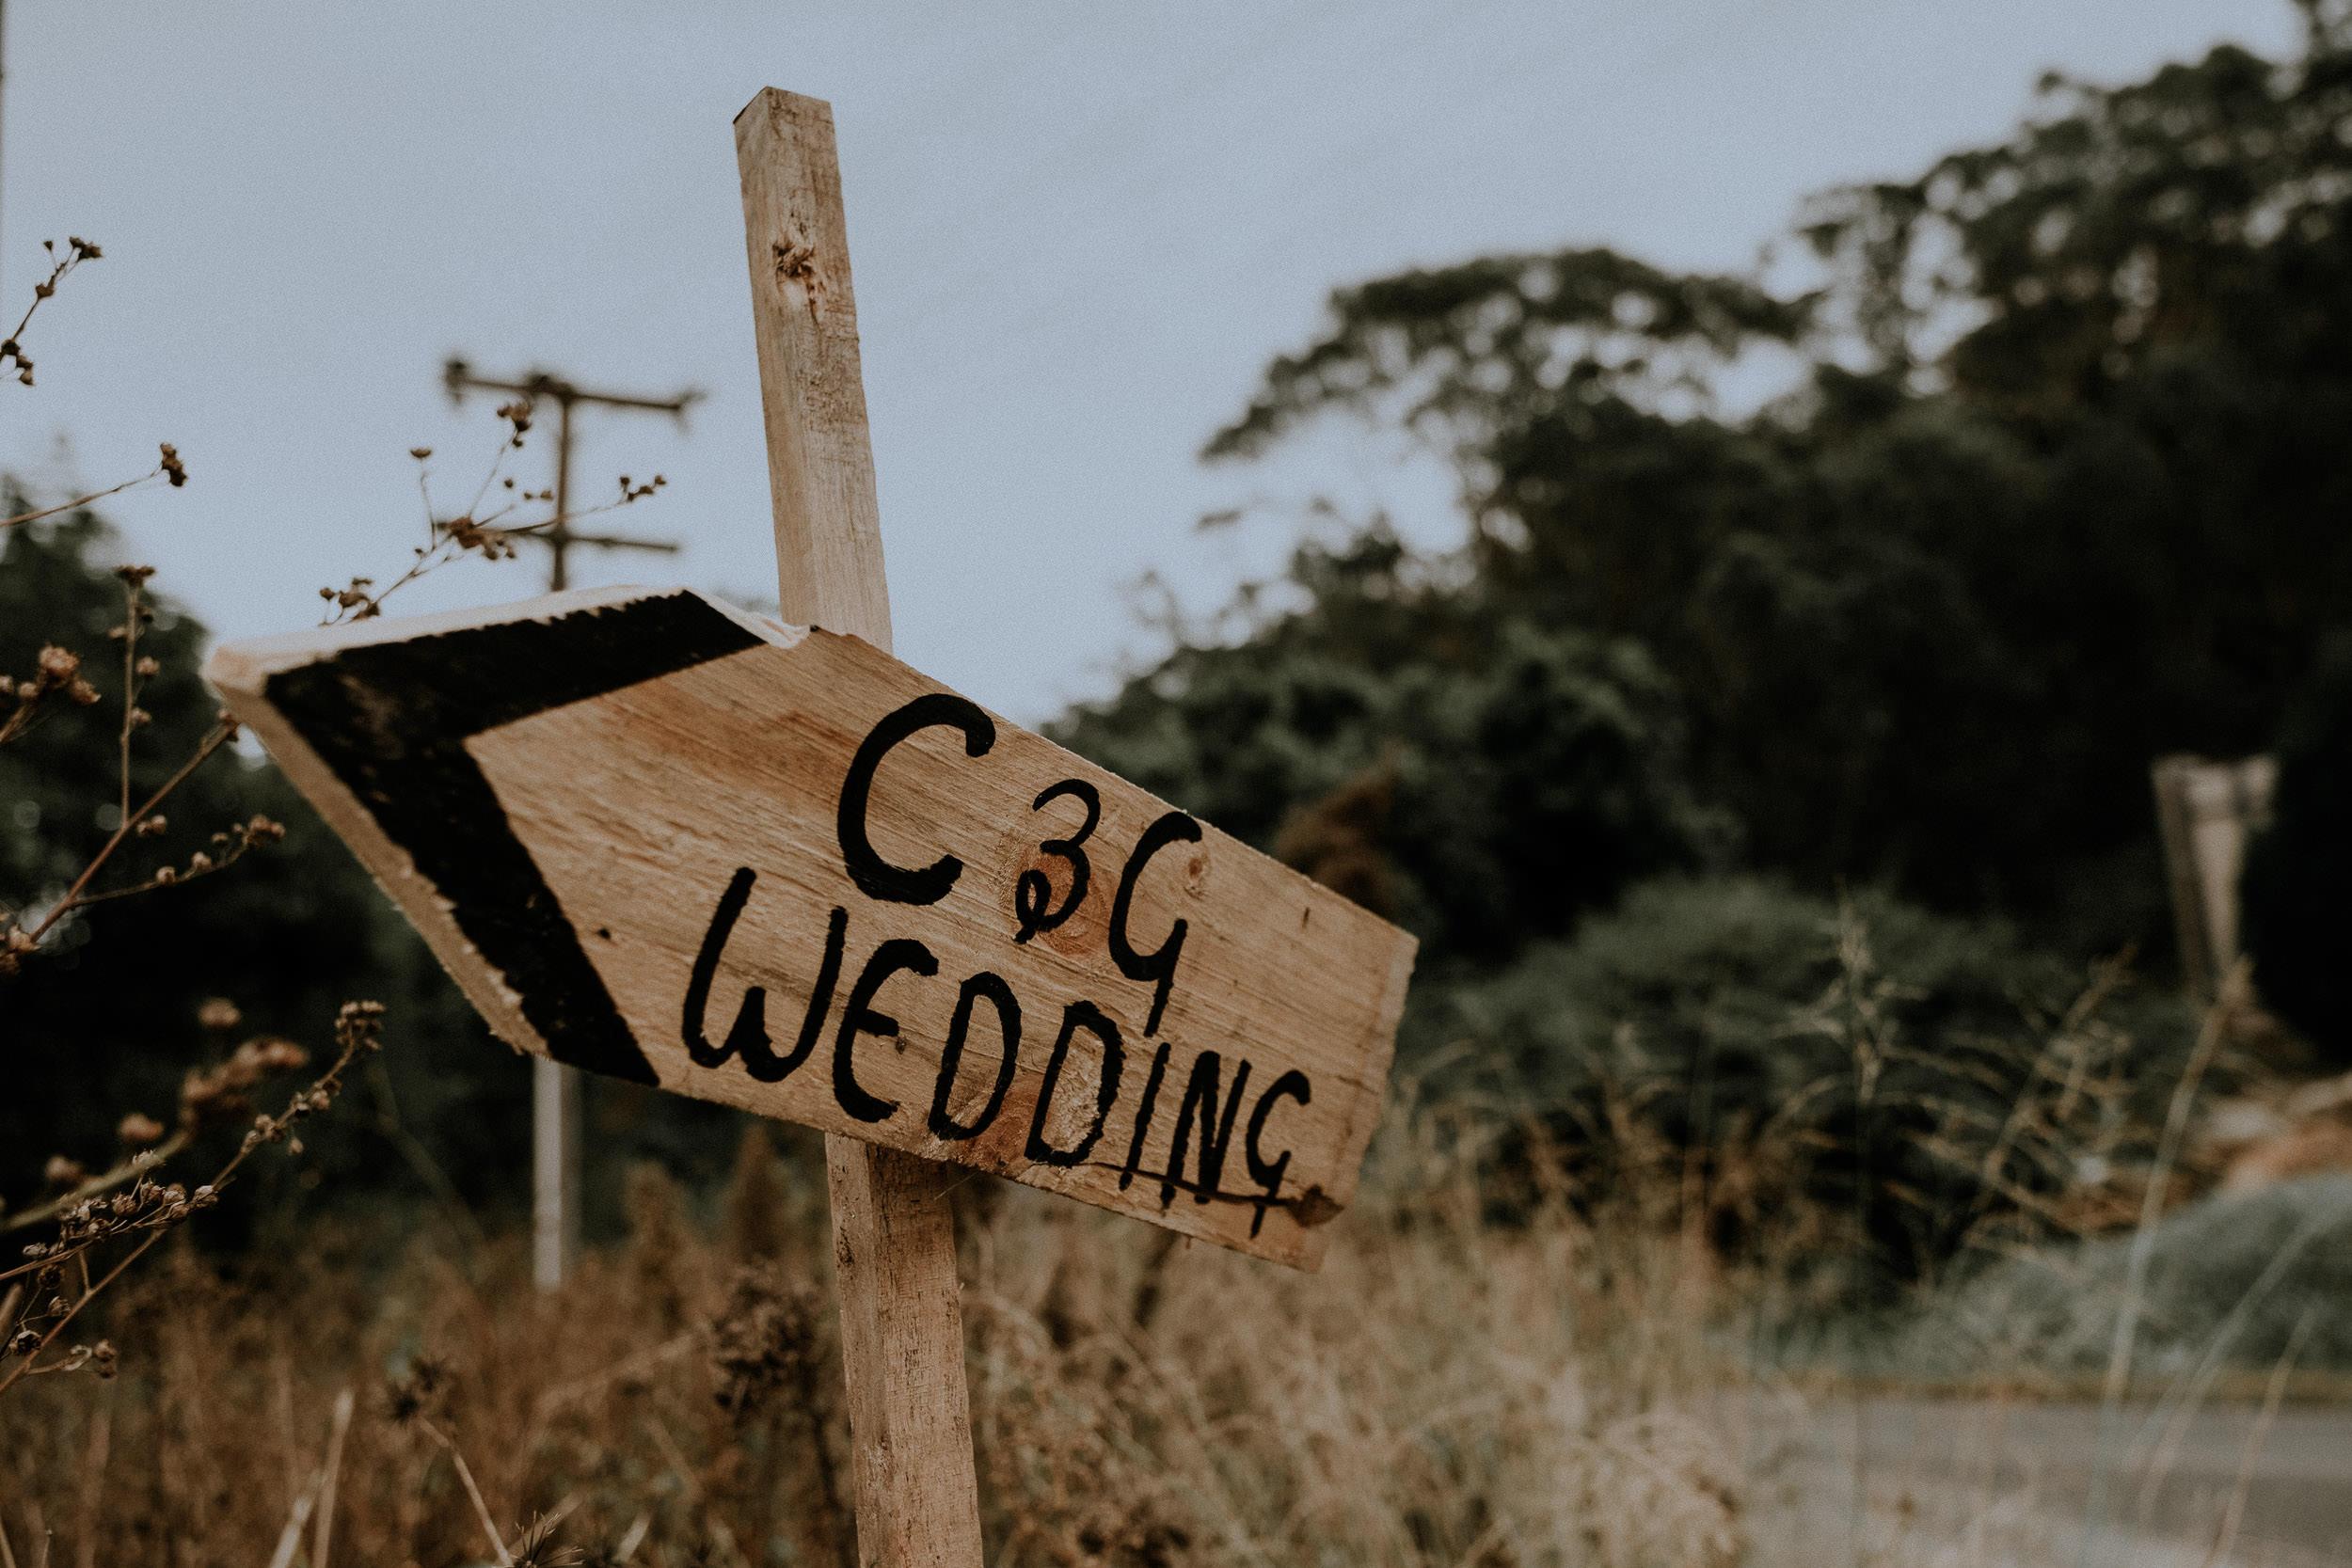 g_c wedding - kings _ thieves elopement wedding photography - blog 2.jpg